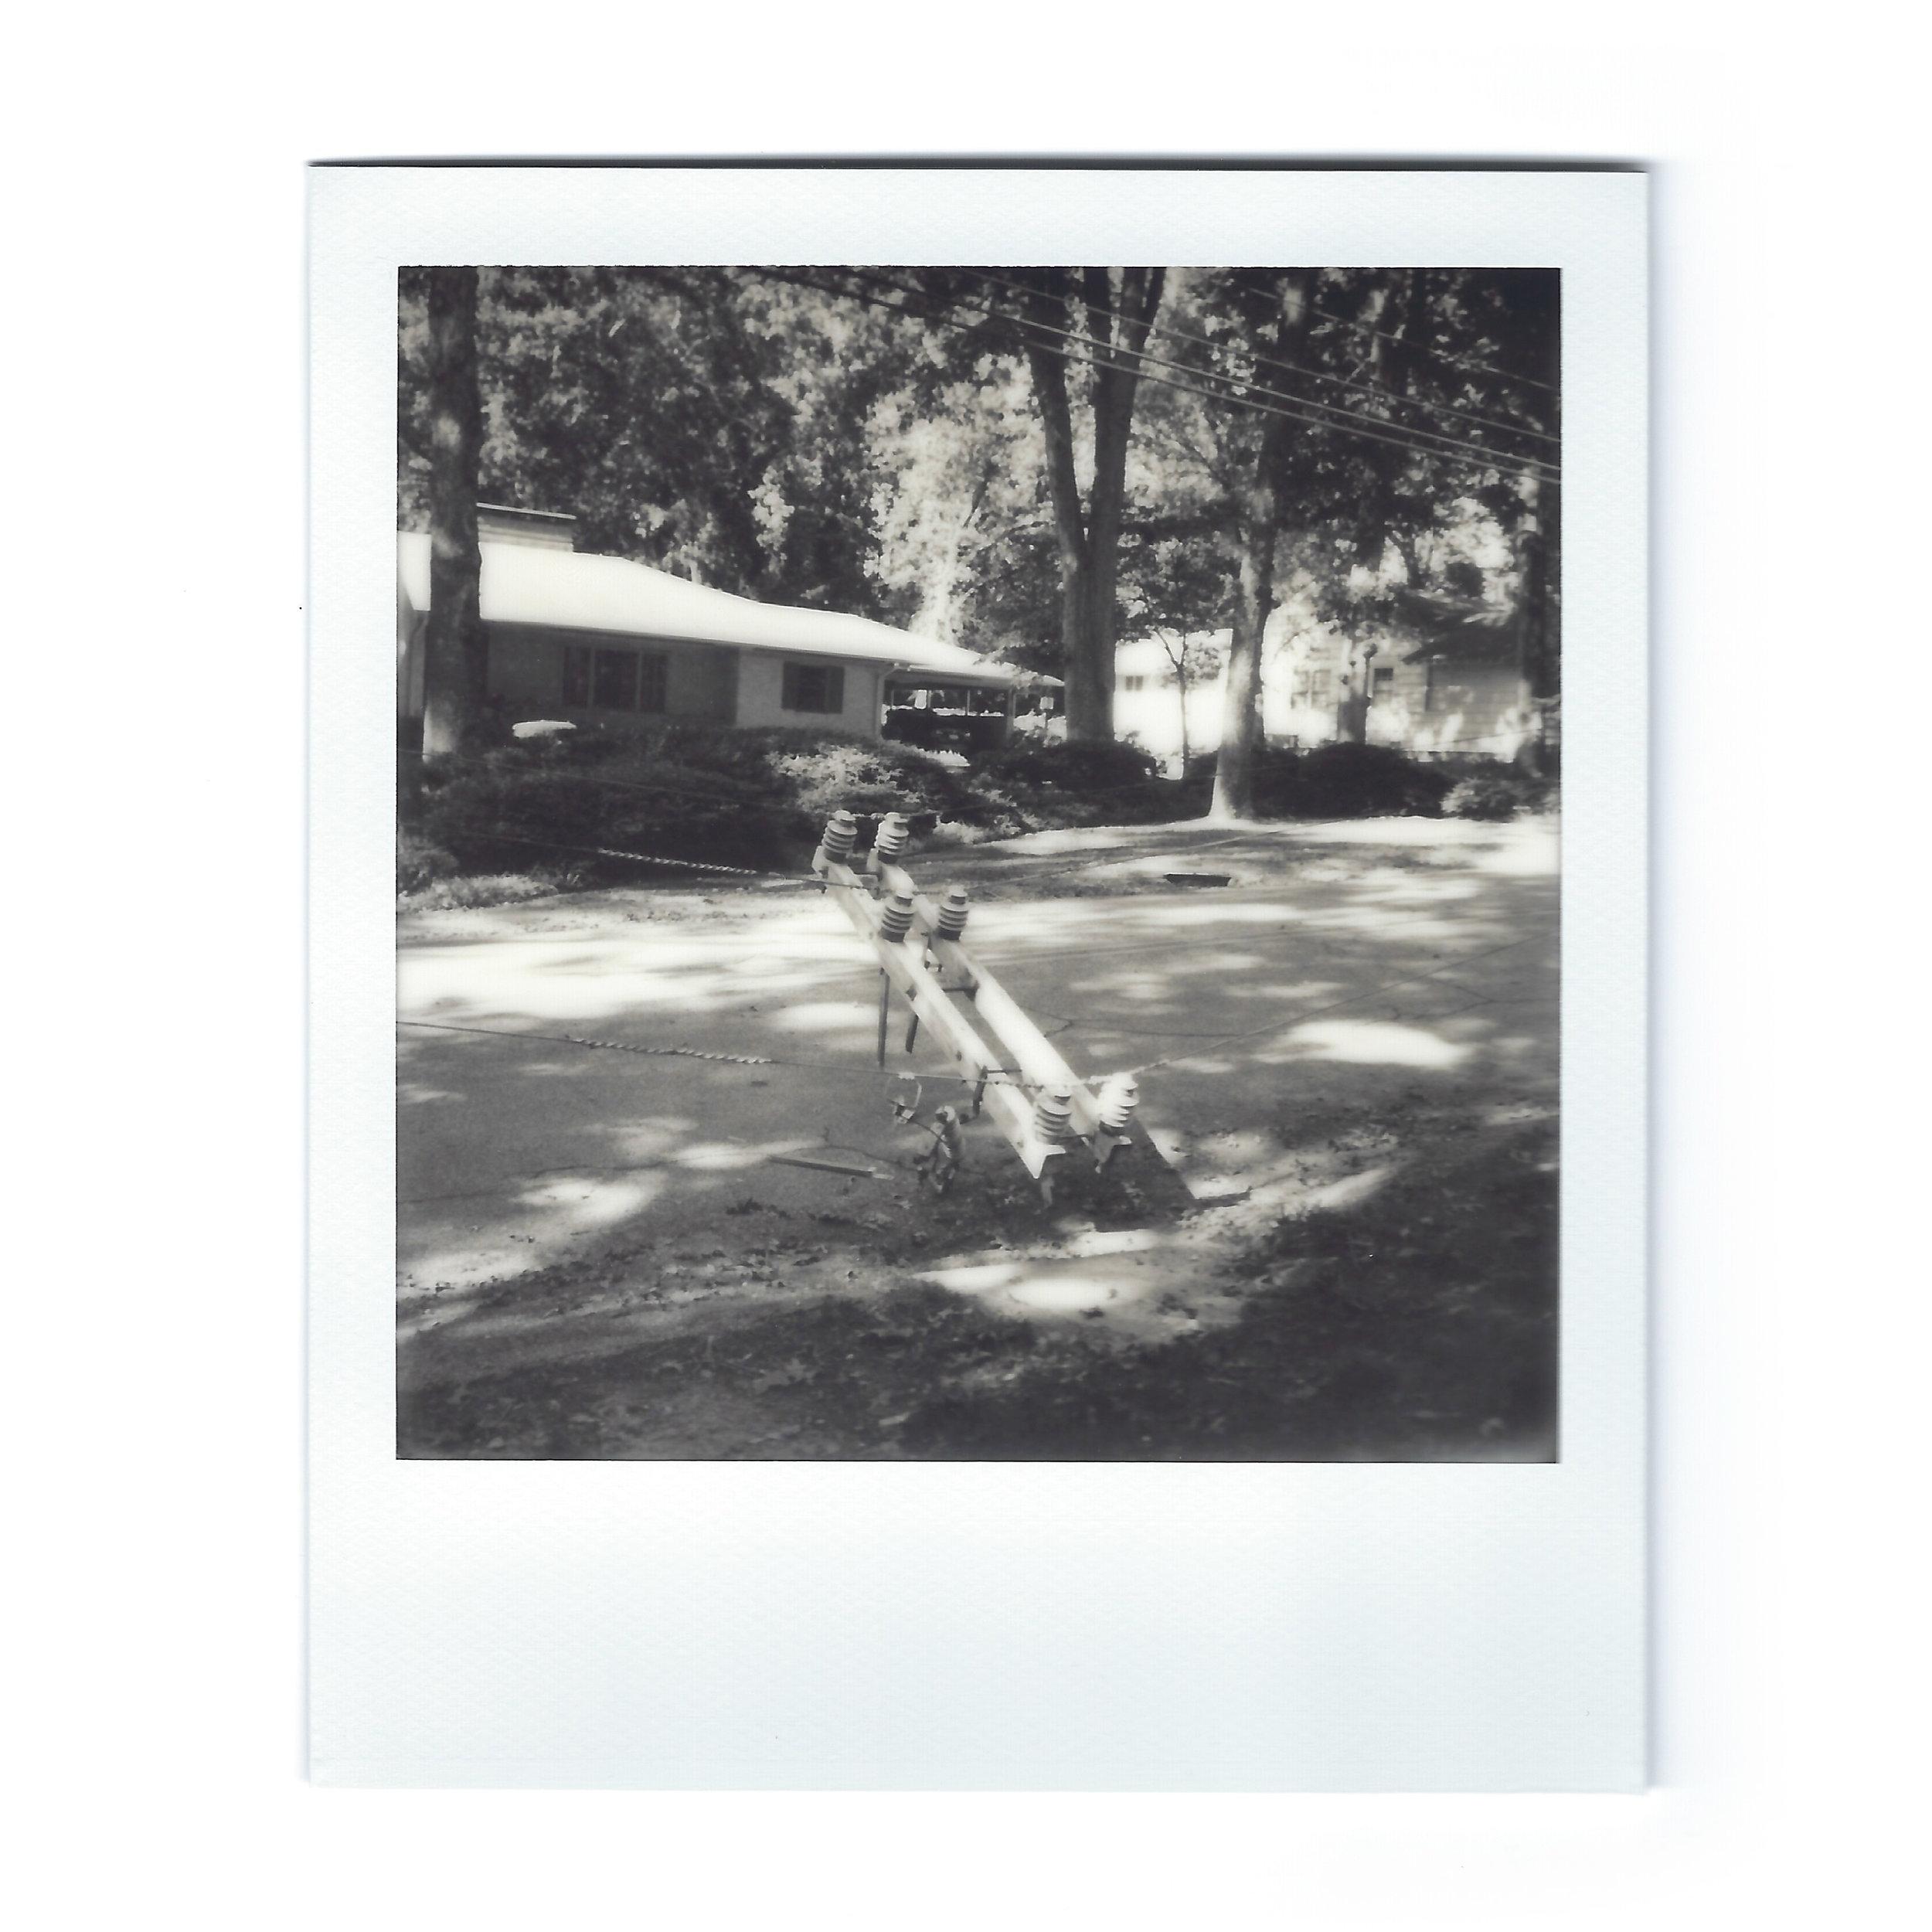 telephone-pole-polaroid.jpg